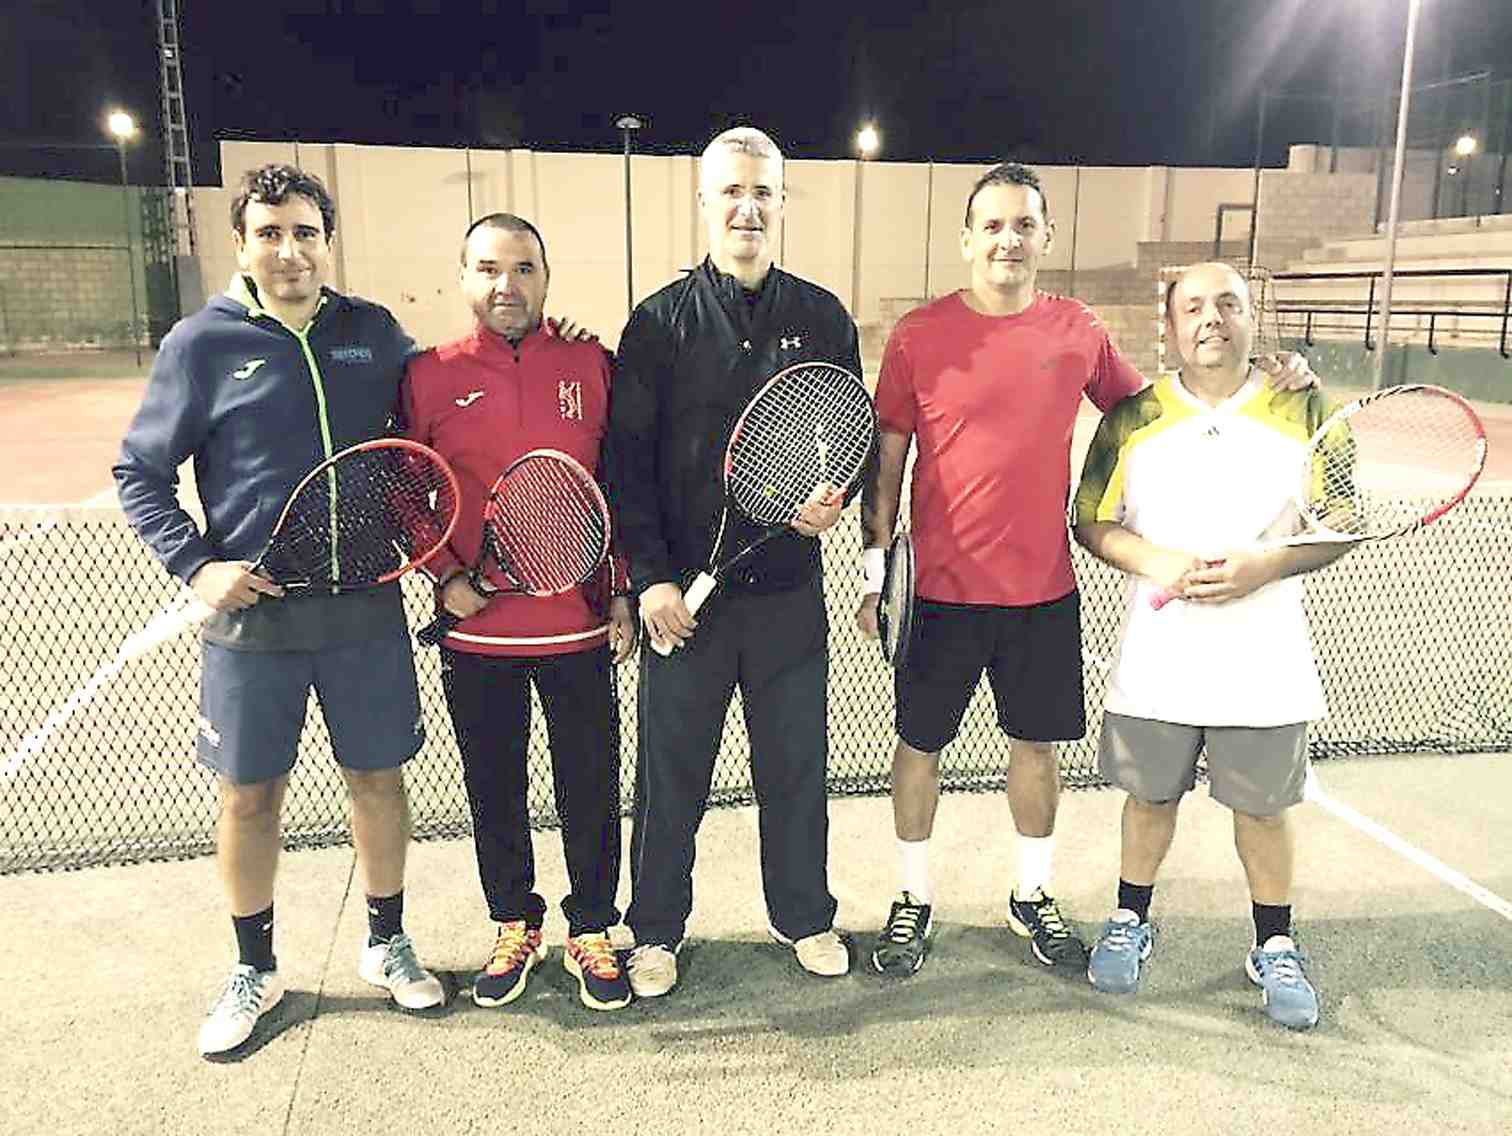 El equipo de Veteranos +40 del Club de Tenis Teixereta de Ibi asciende a la Primera División Autonómica